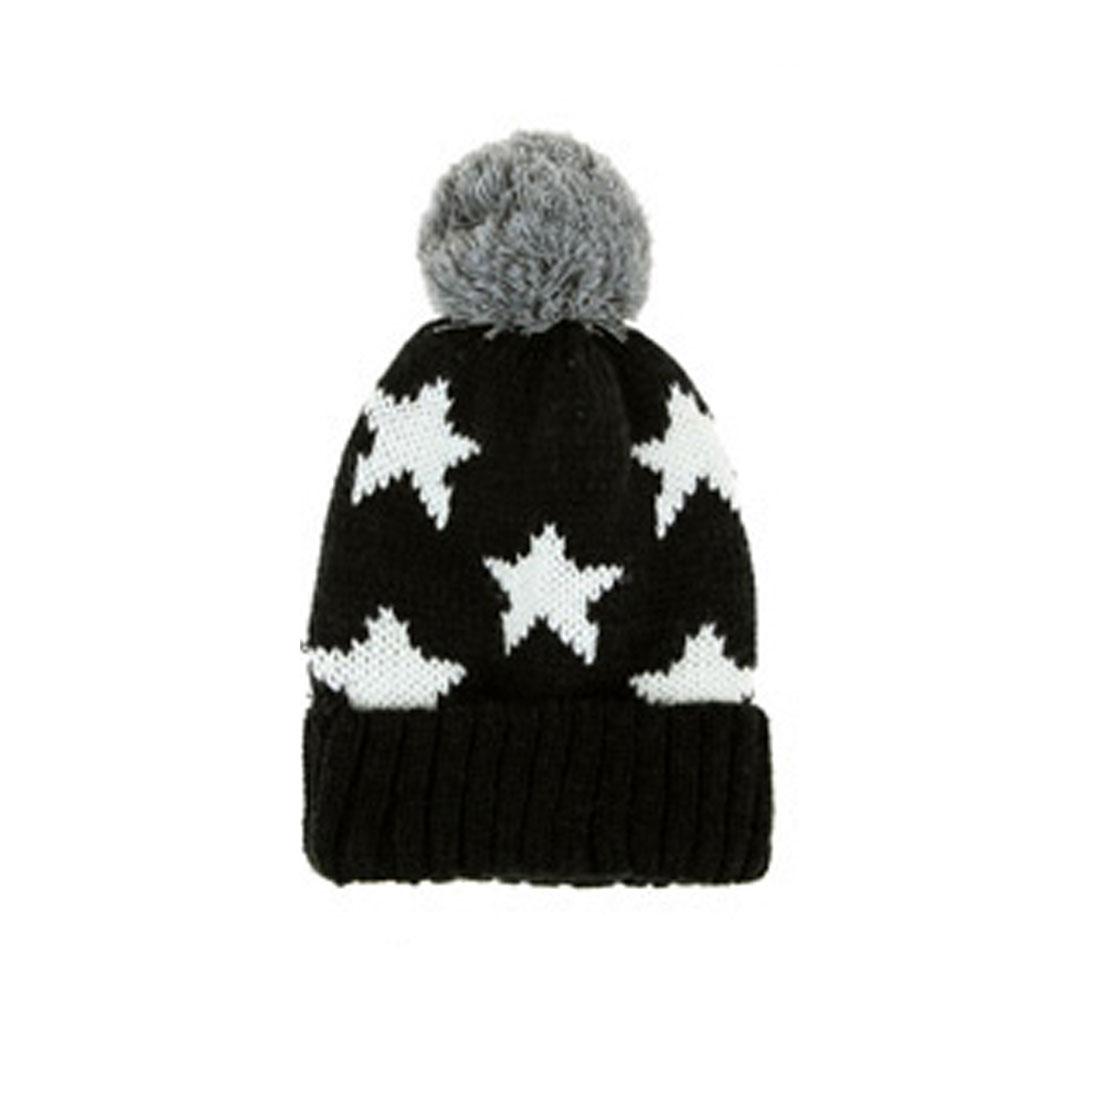 Mens Black White Gray Pom Pom Top Knitting Warmer Beanie Hat